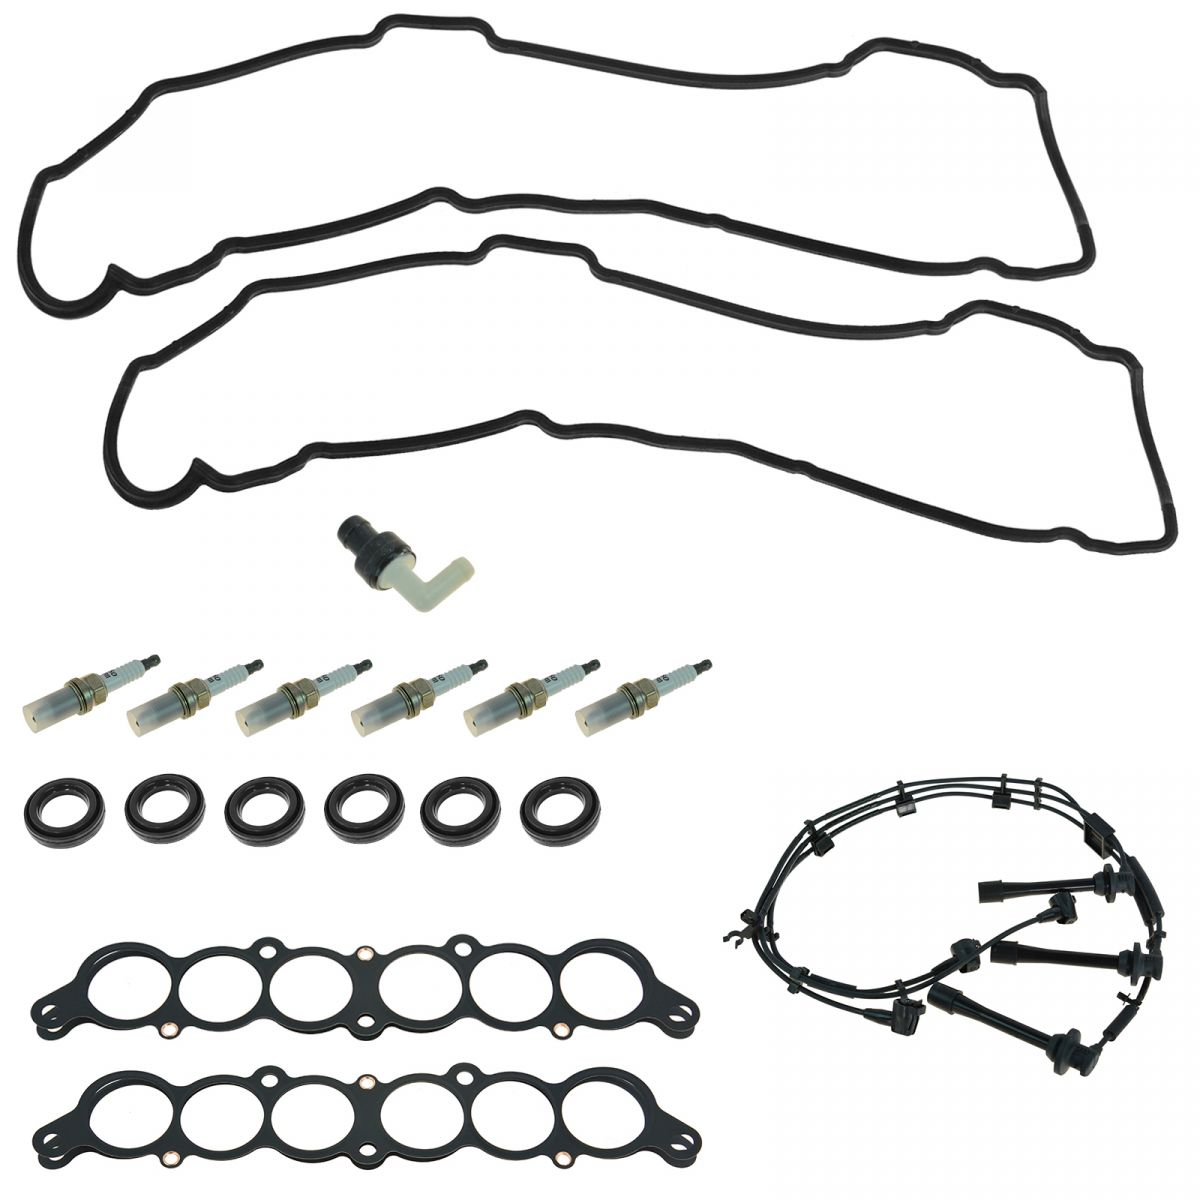 Oem Tune Up Kit Amp Gasket Set 18 Piece For Toyota Lexus V6